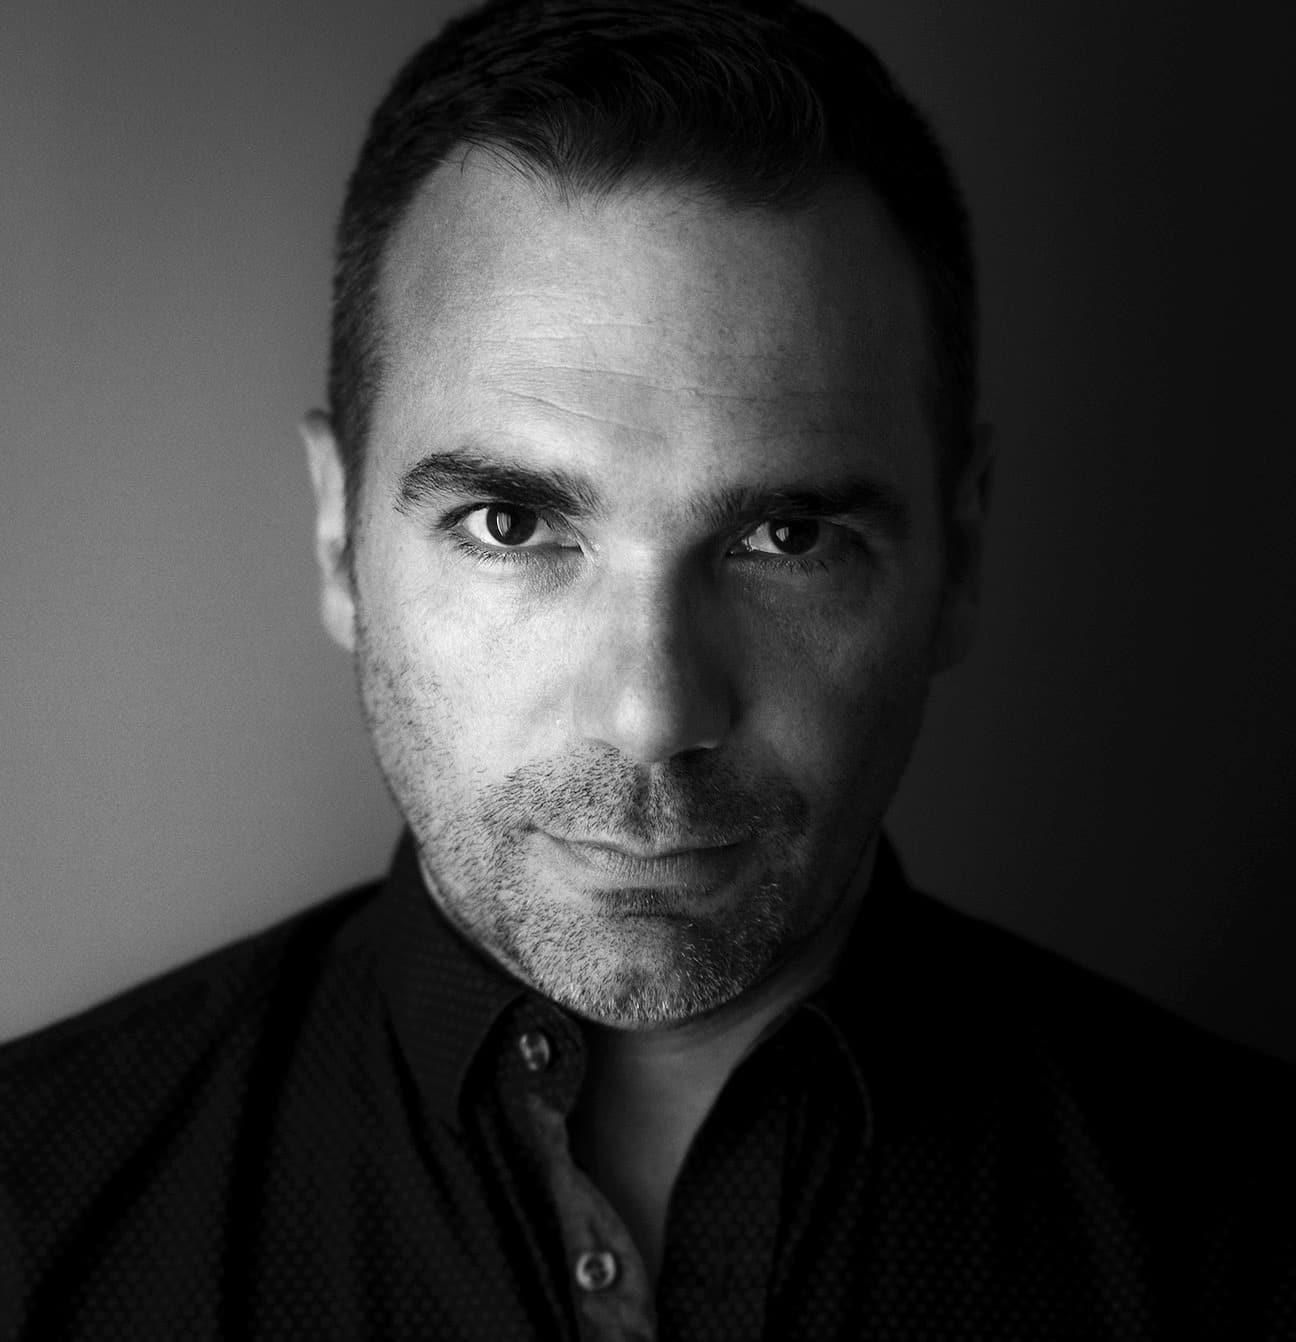 Yves Narbonne Auteur Author Livre Book Montreal